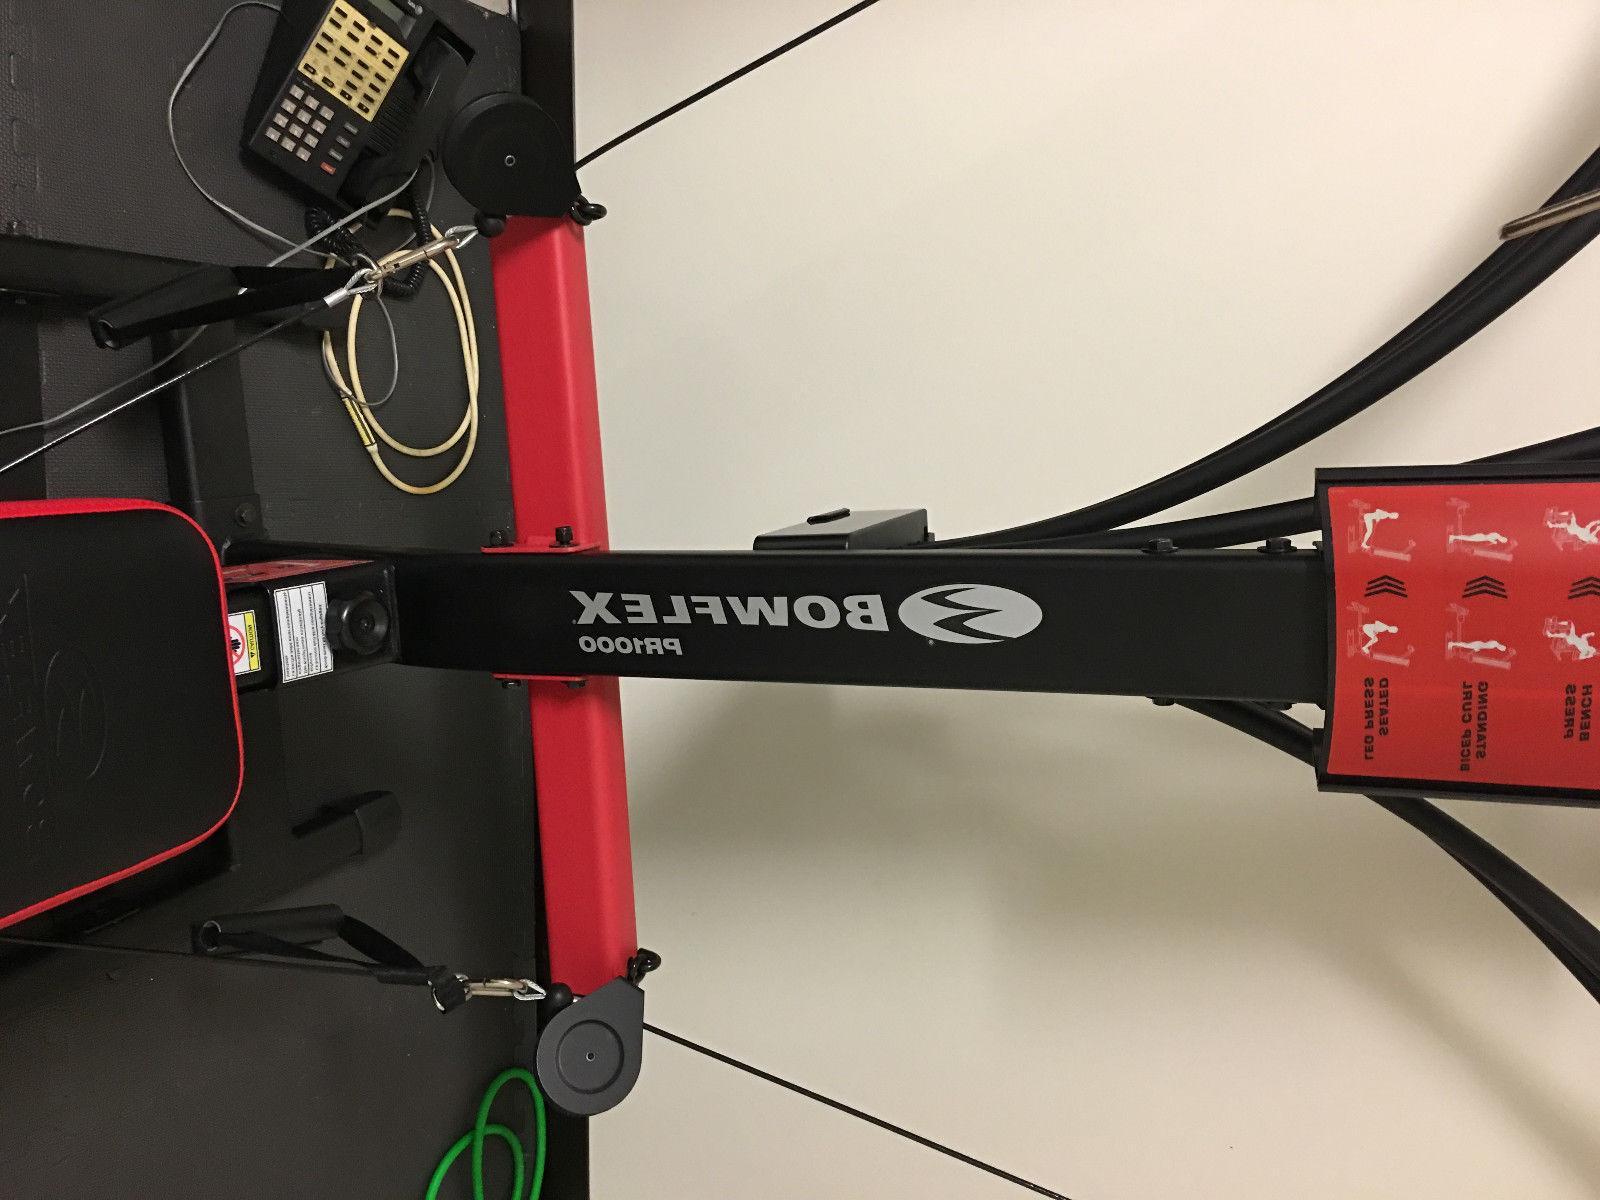 Bowflex Model 100141